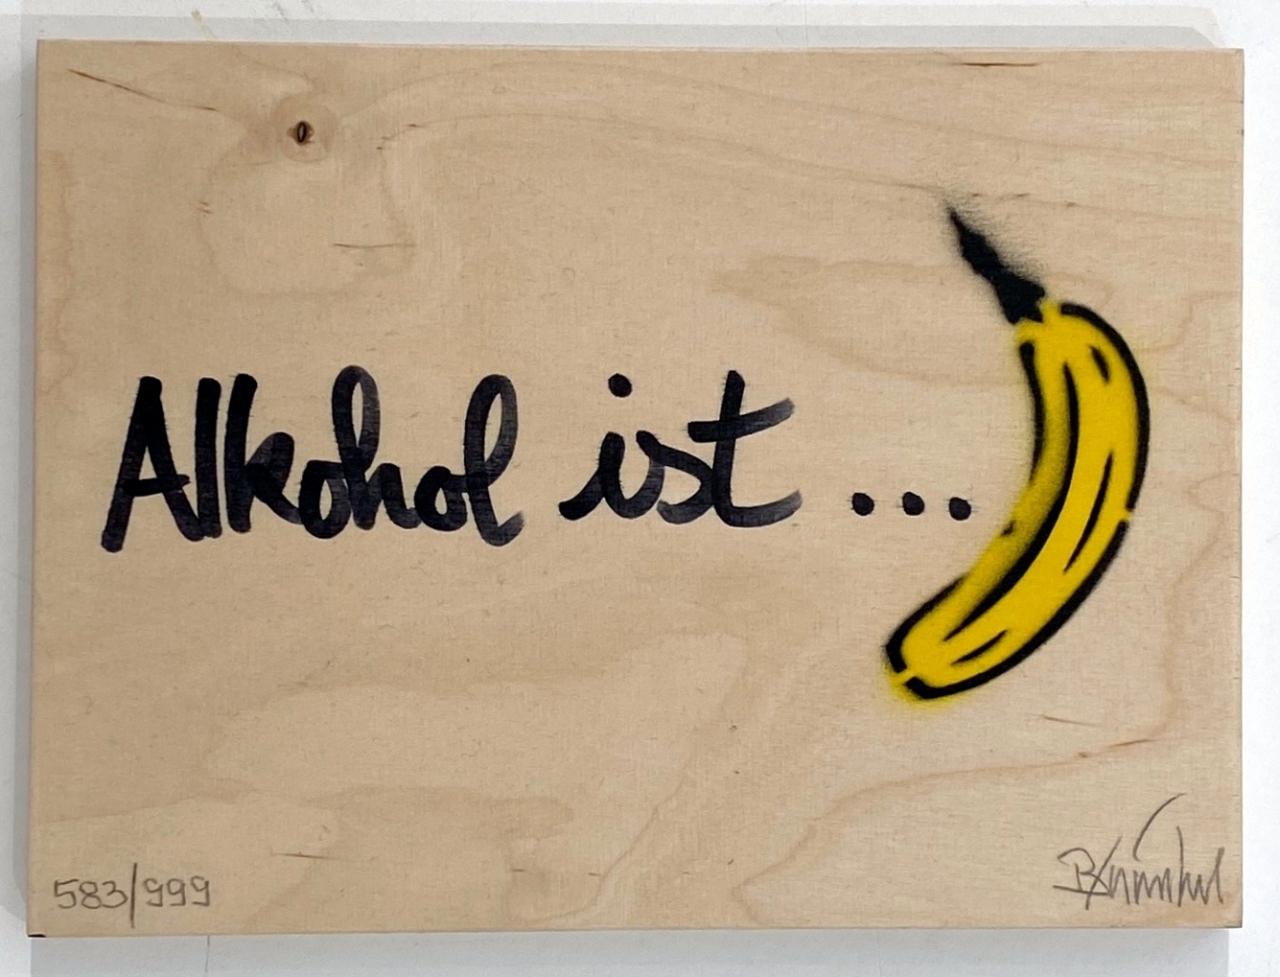 Alkohol ist Banane